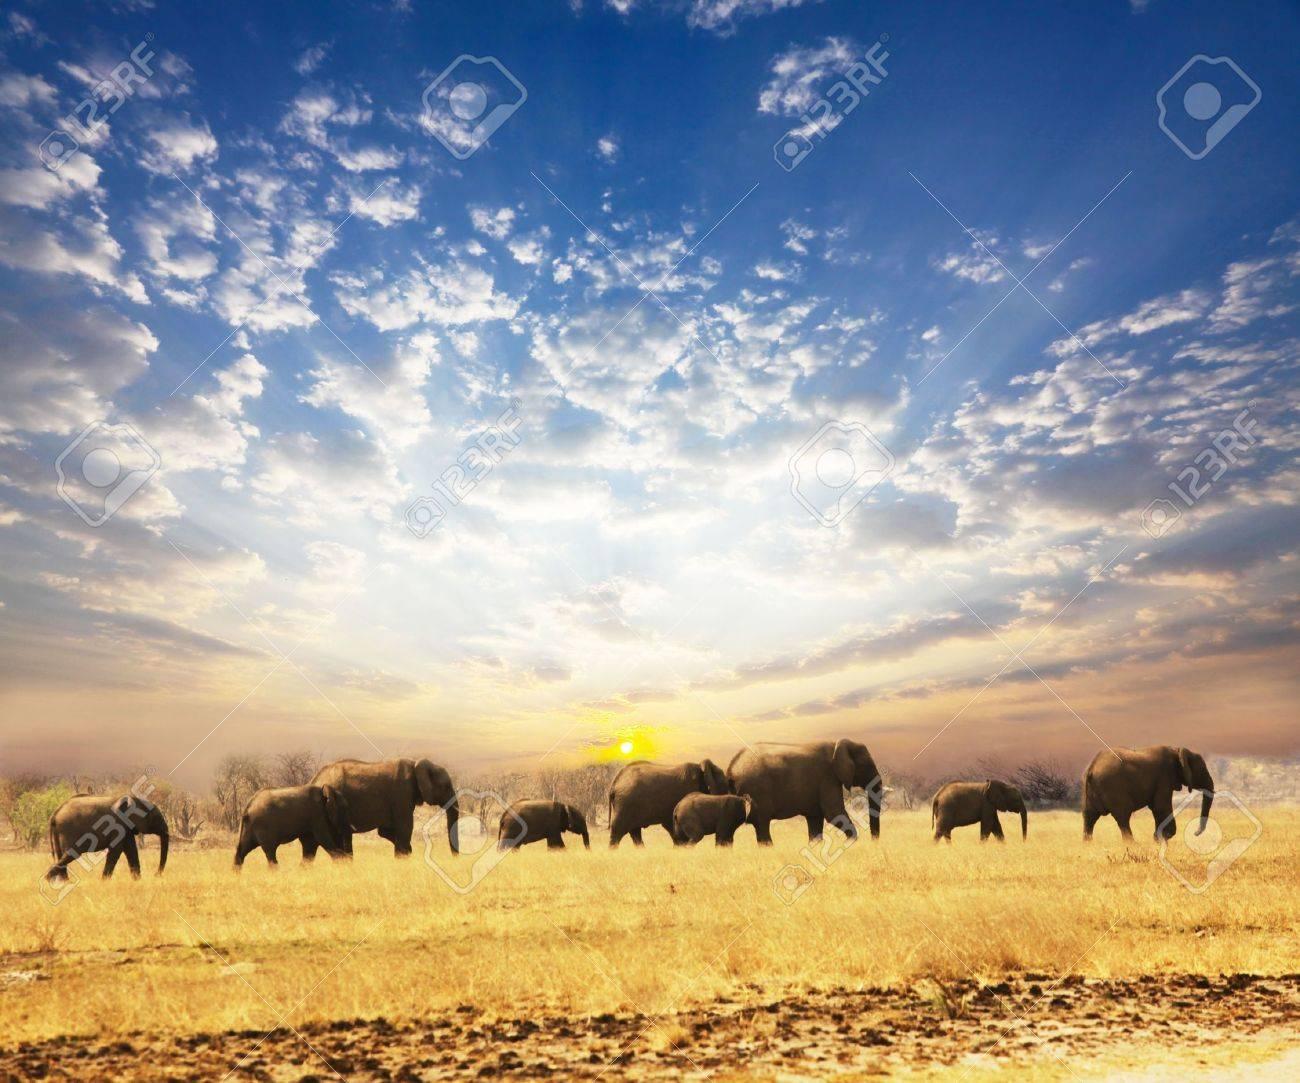 Elephant Stock Photo - 5658861